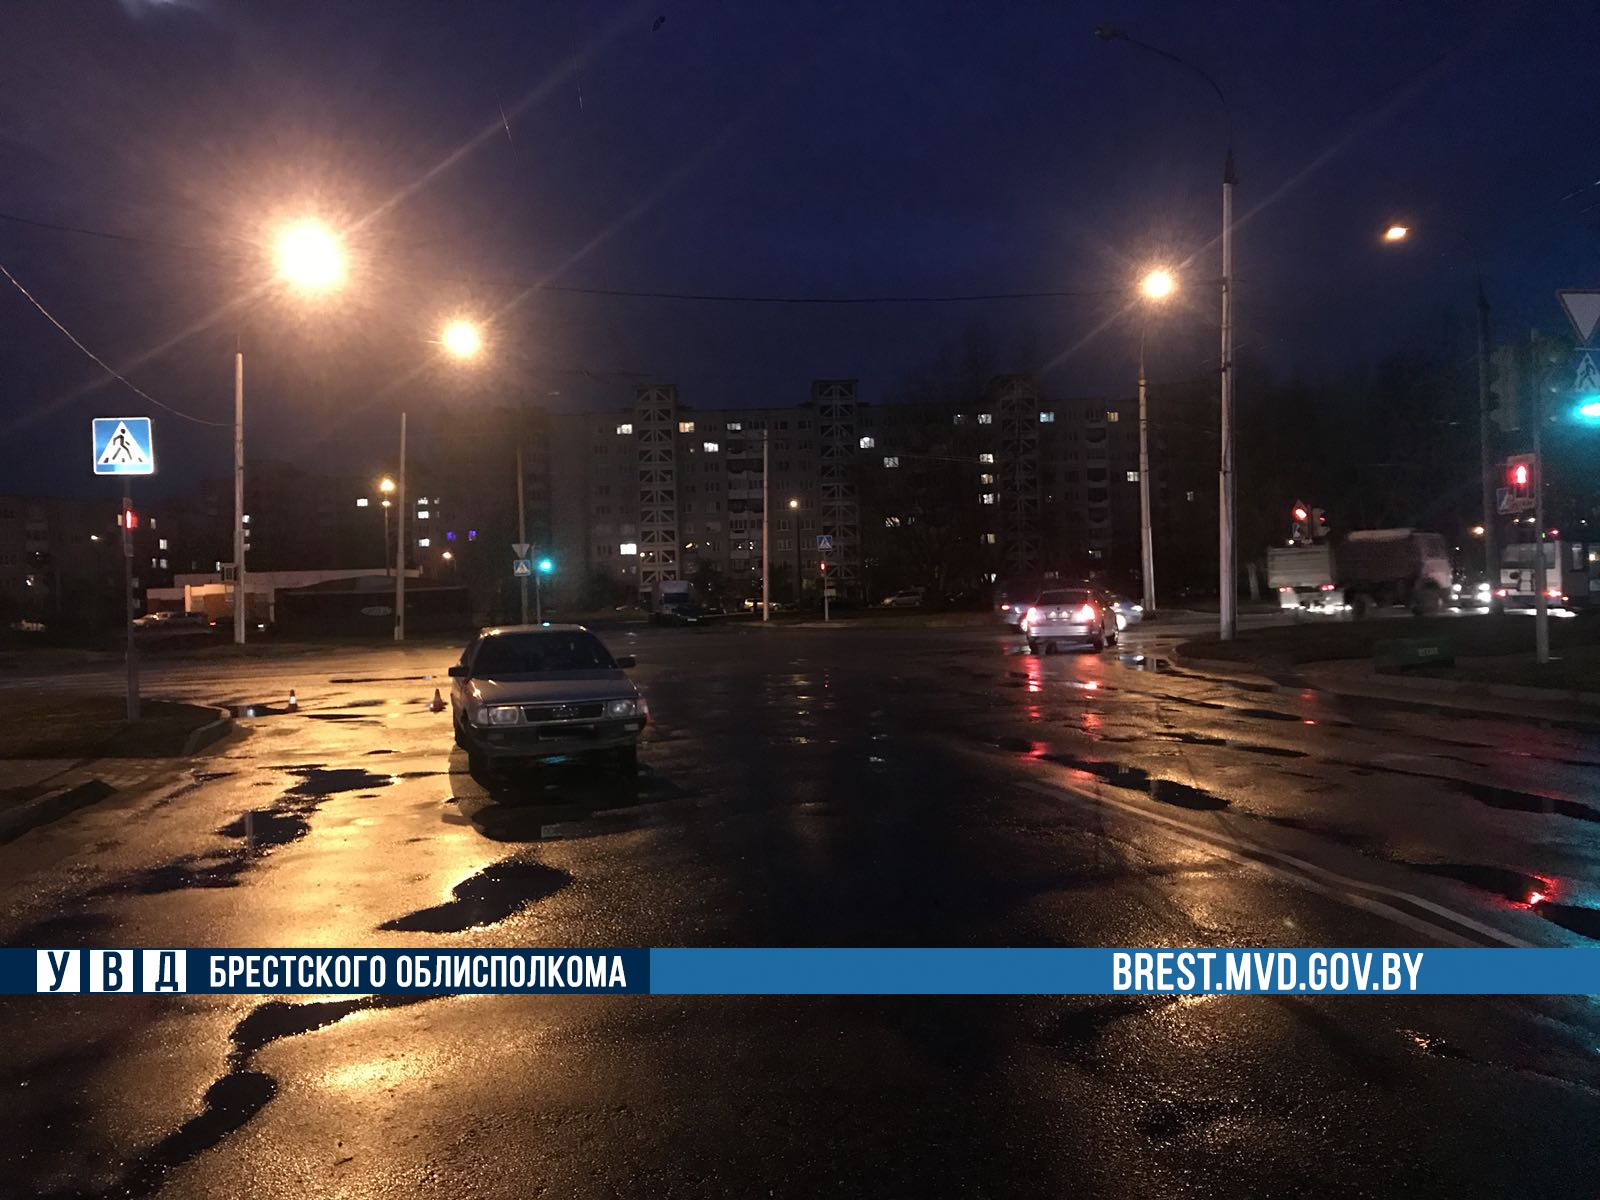 Сегодня утром дедушка на автомобиле Ауди-100 на ул. Гродненской сбил бабушку